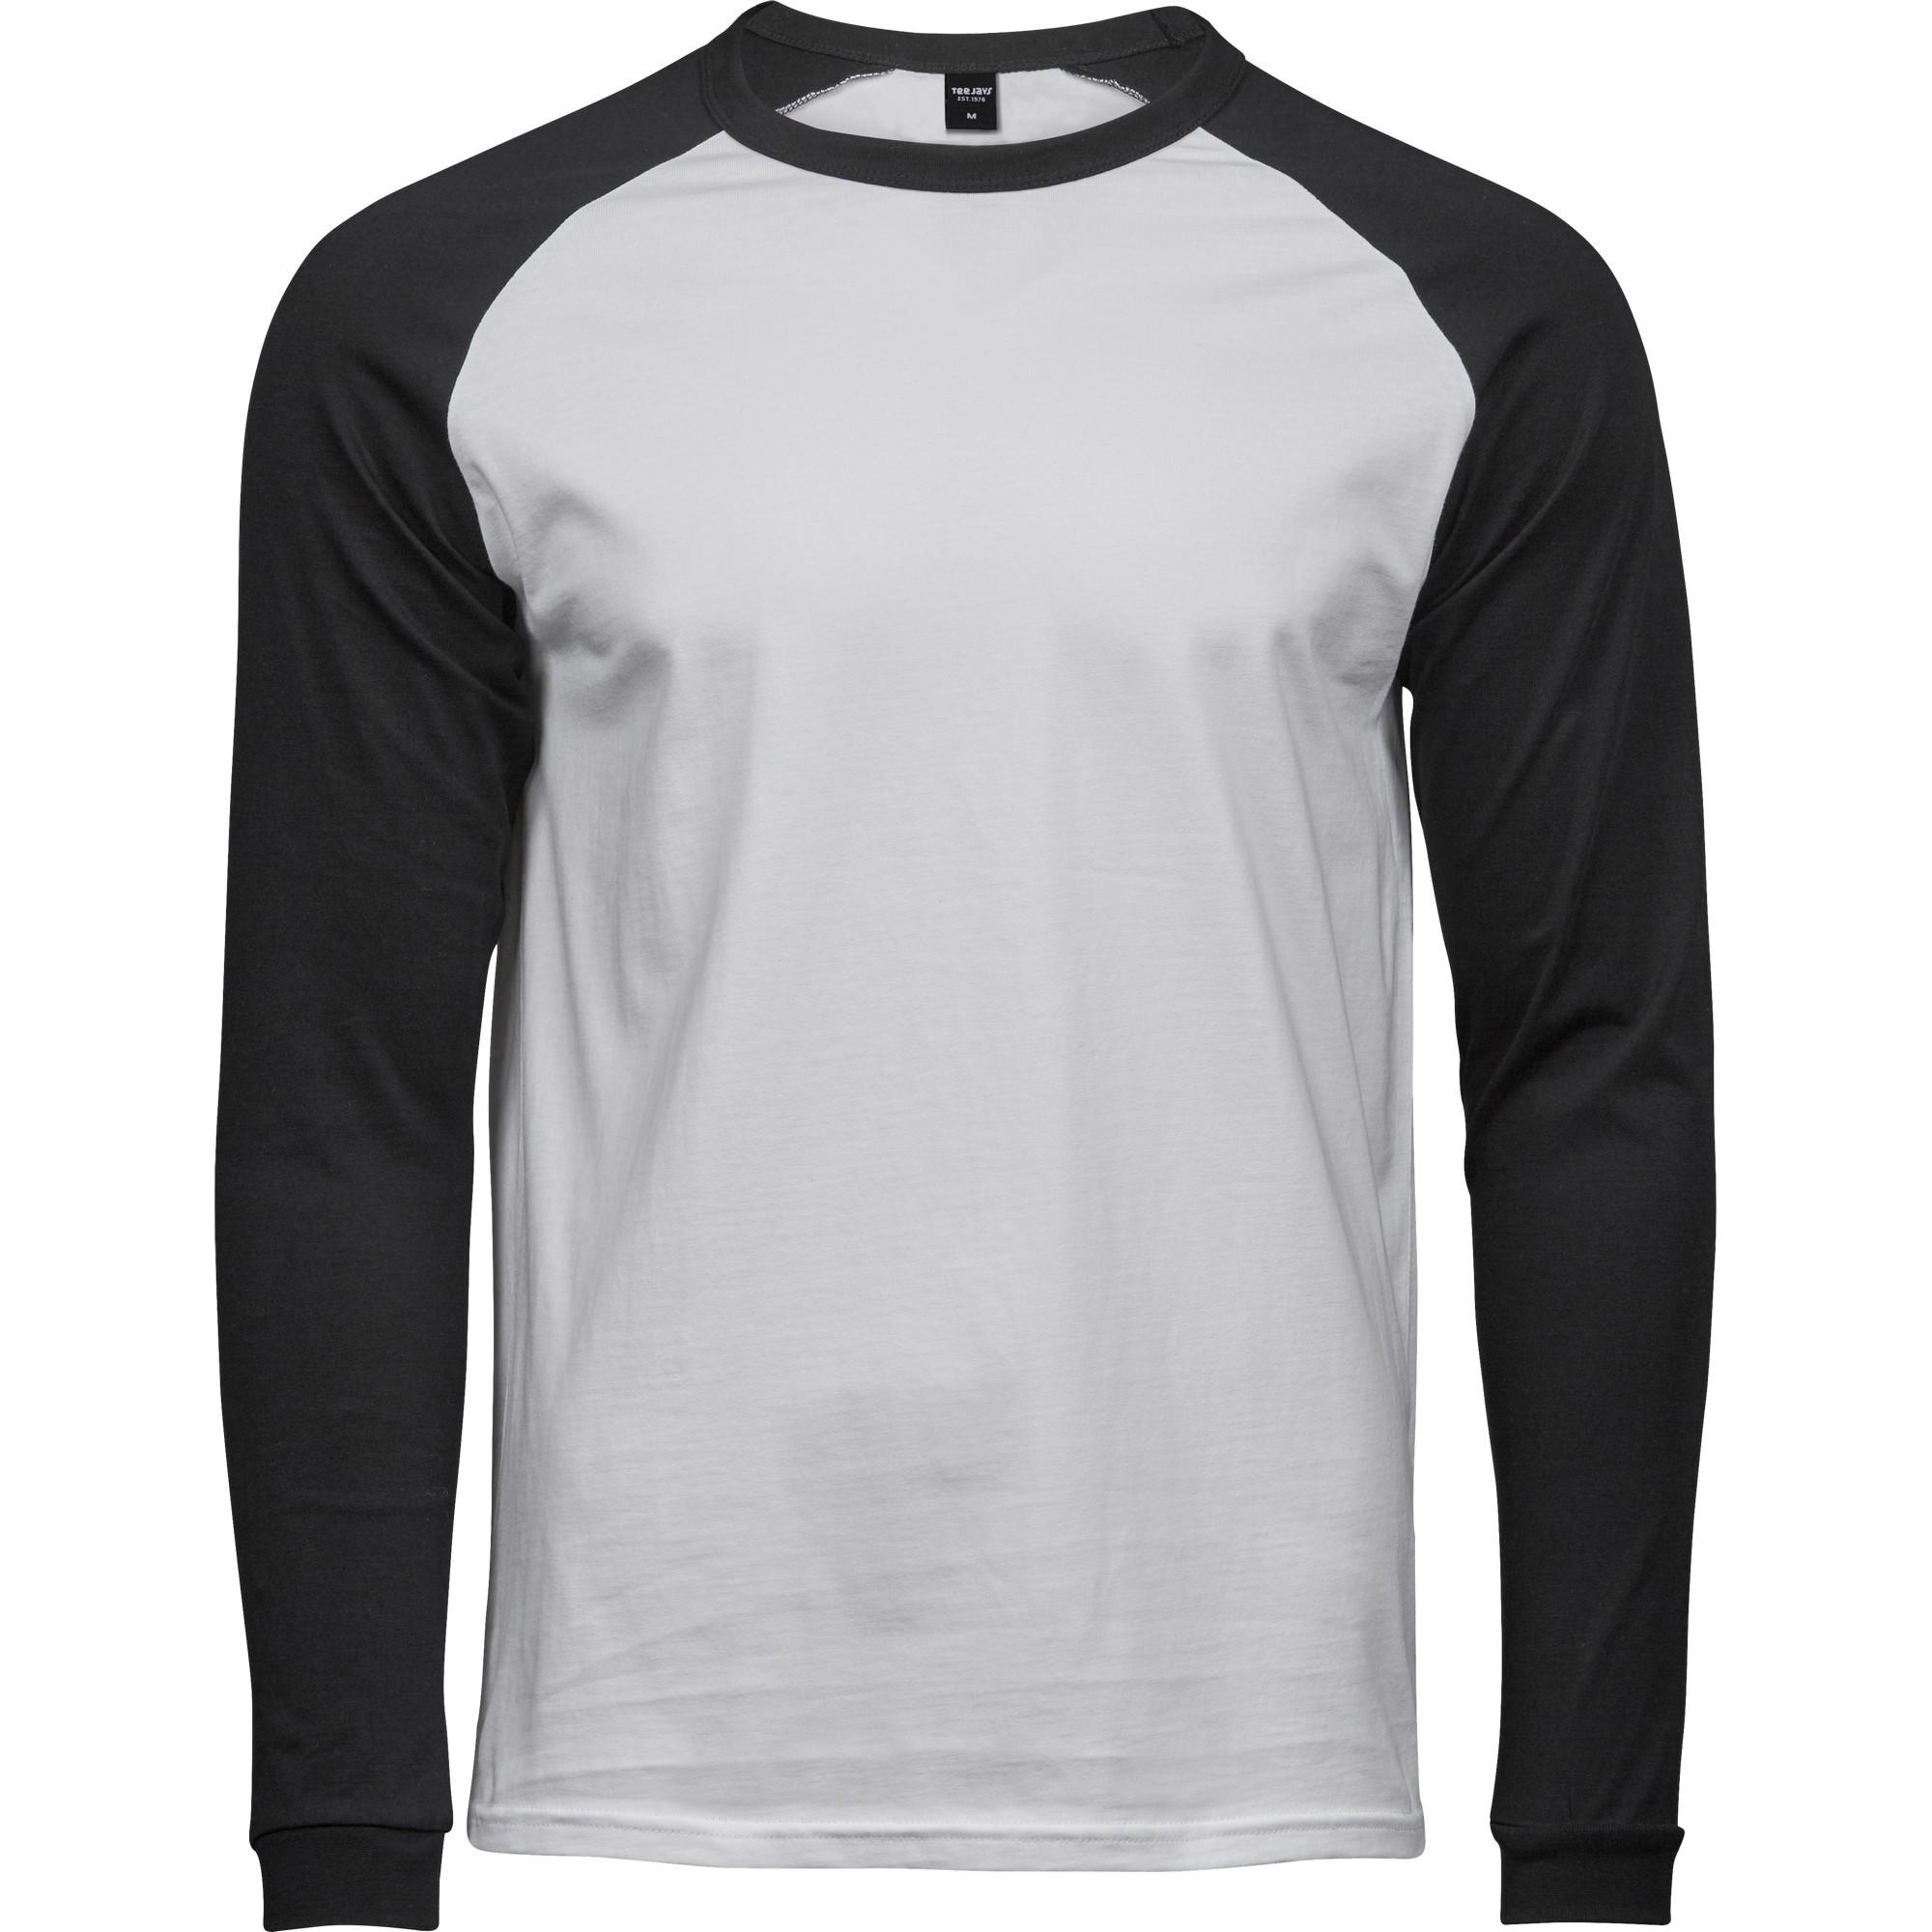 Tee Jays Mens Long Sleeve Baseball T-Shirt (XXL) (White/Black)